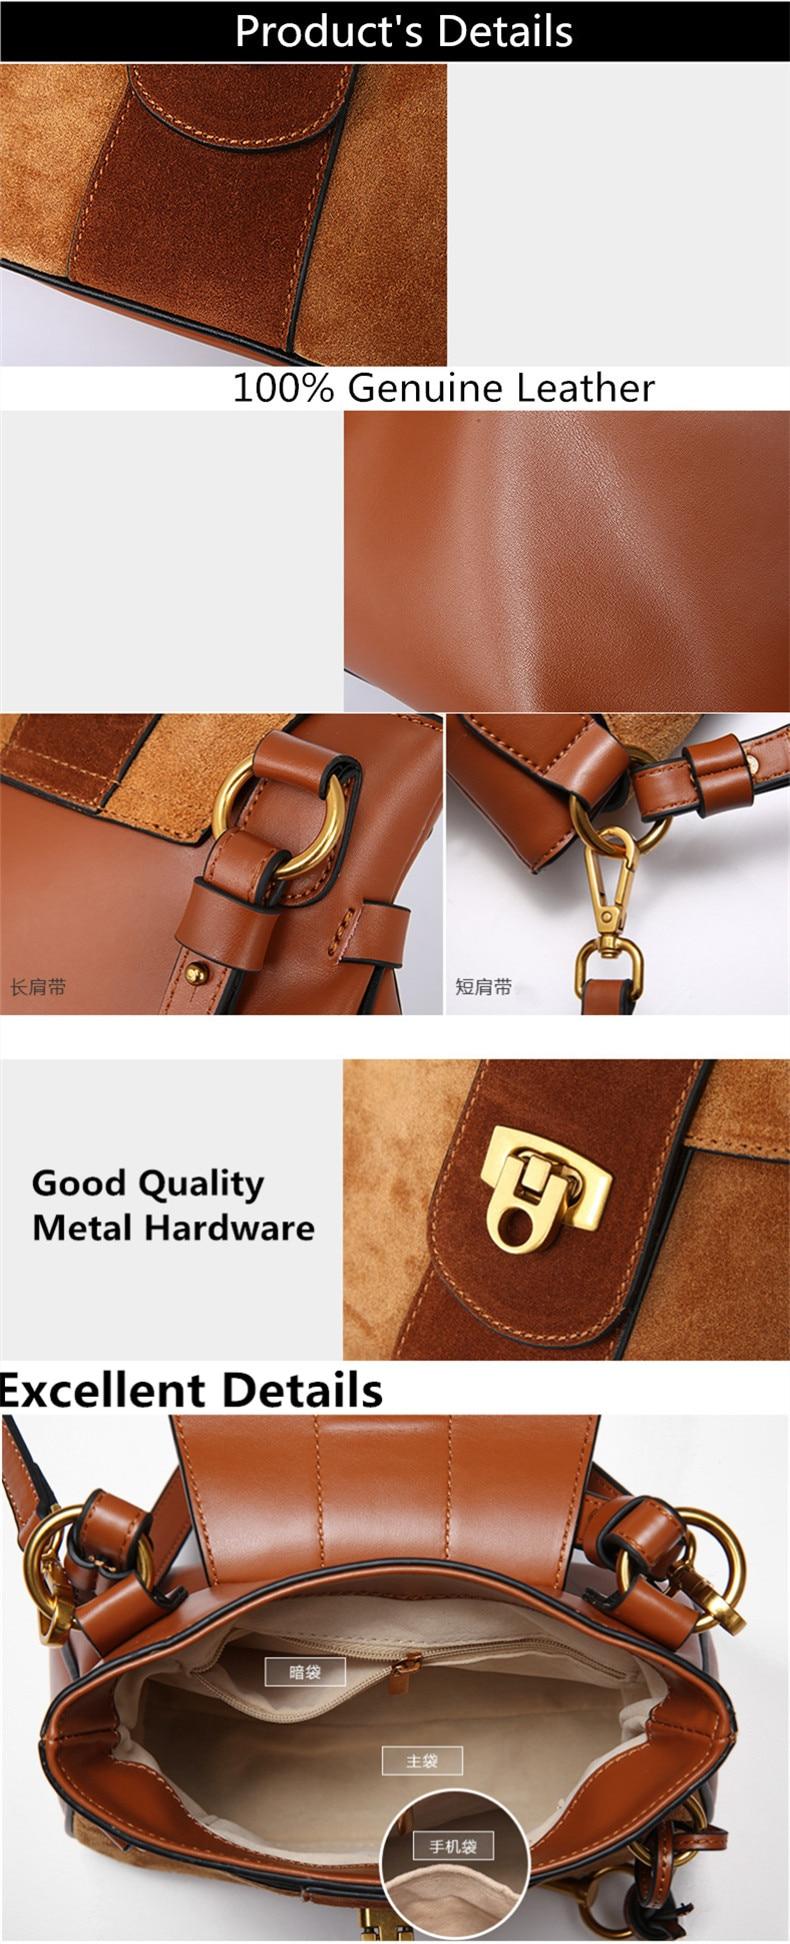 Luxury Handbag Women Designer Genuine Leather Bag Women Leather Handbags Shoulder Messenger Bag handbag bolsos muje (1)